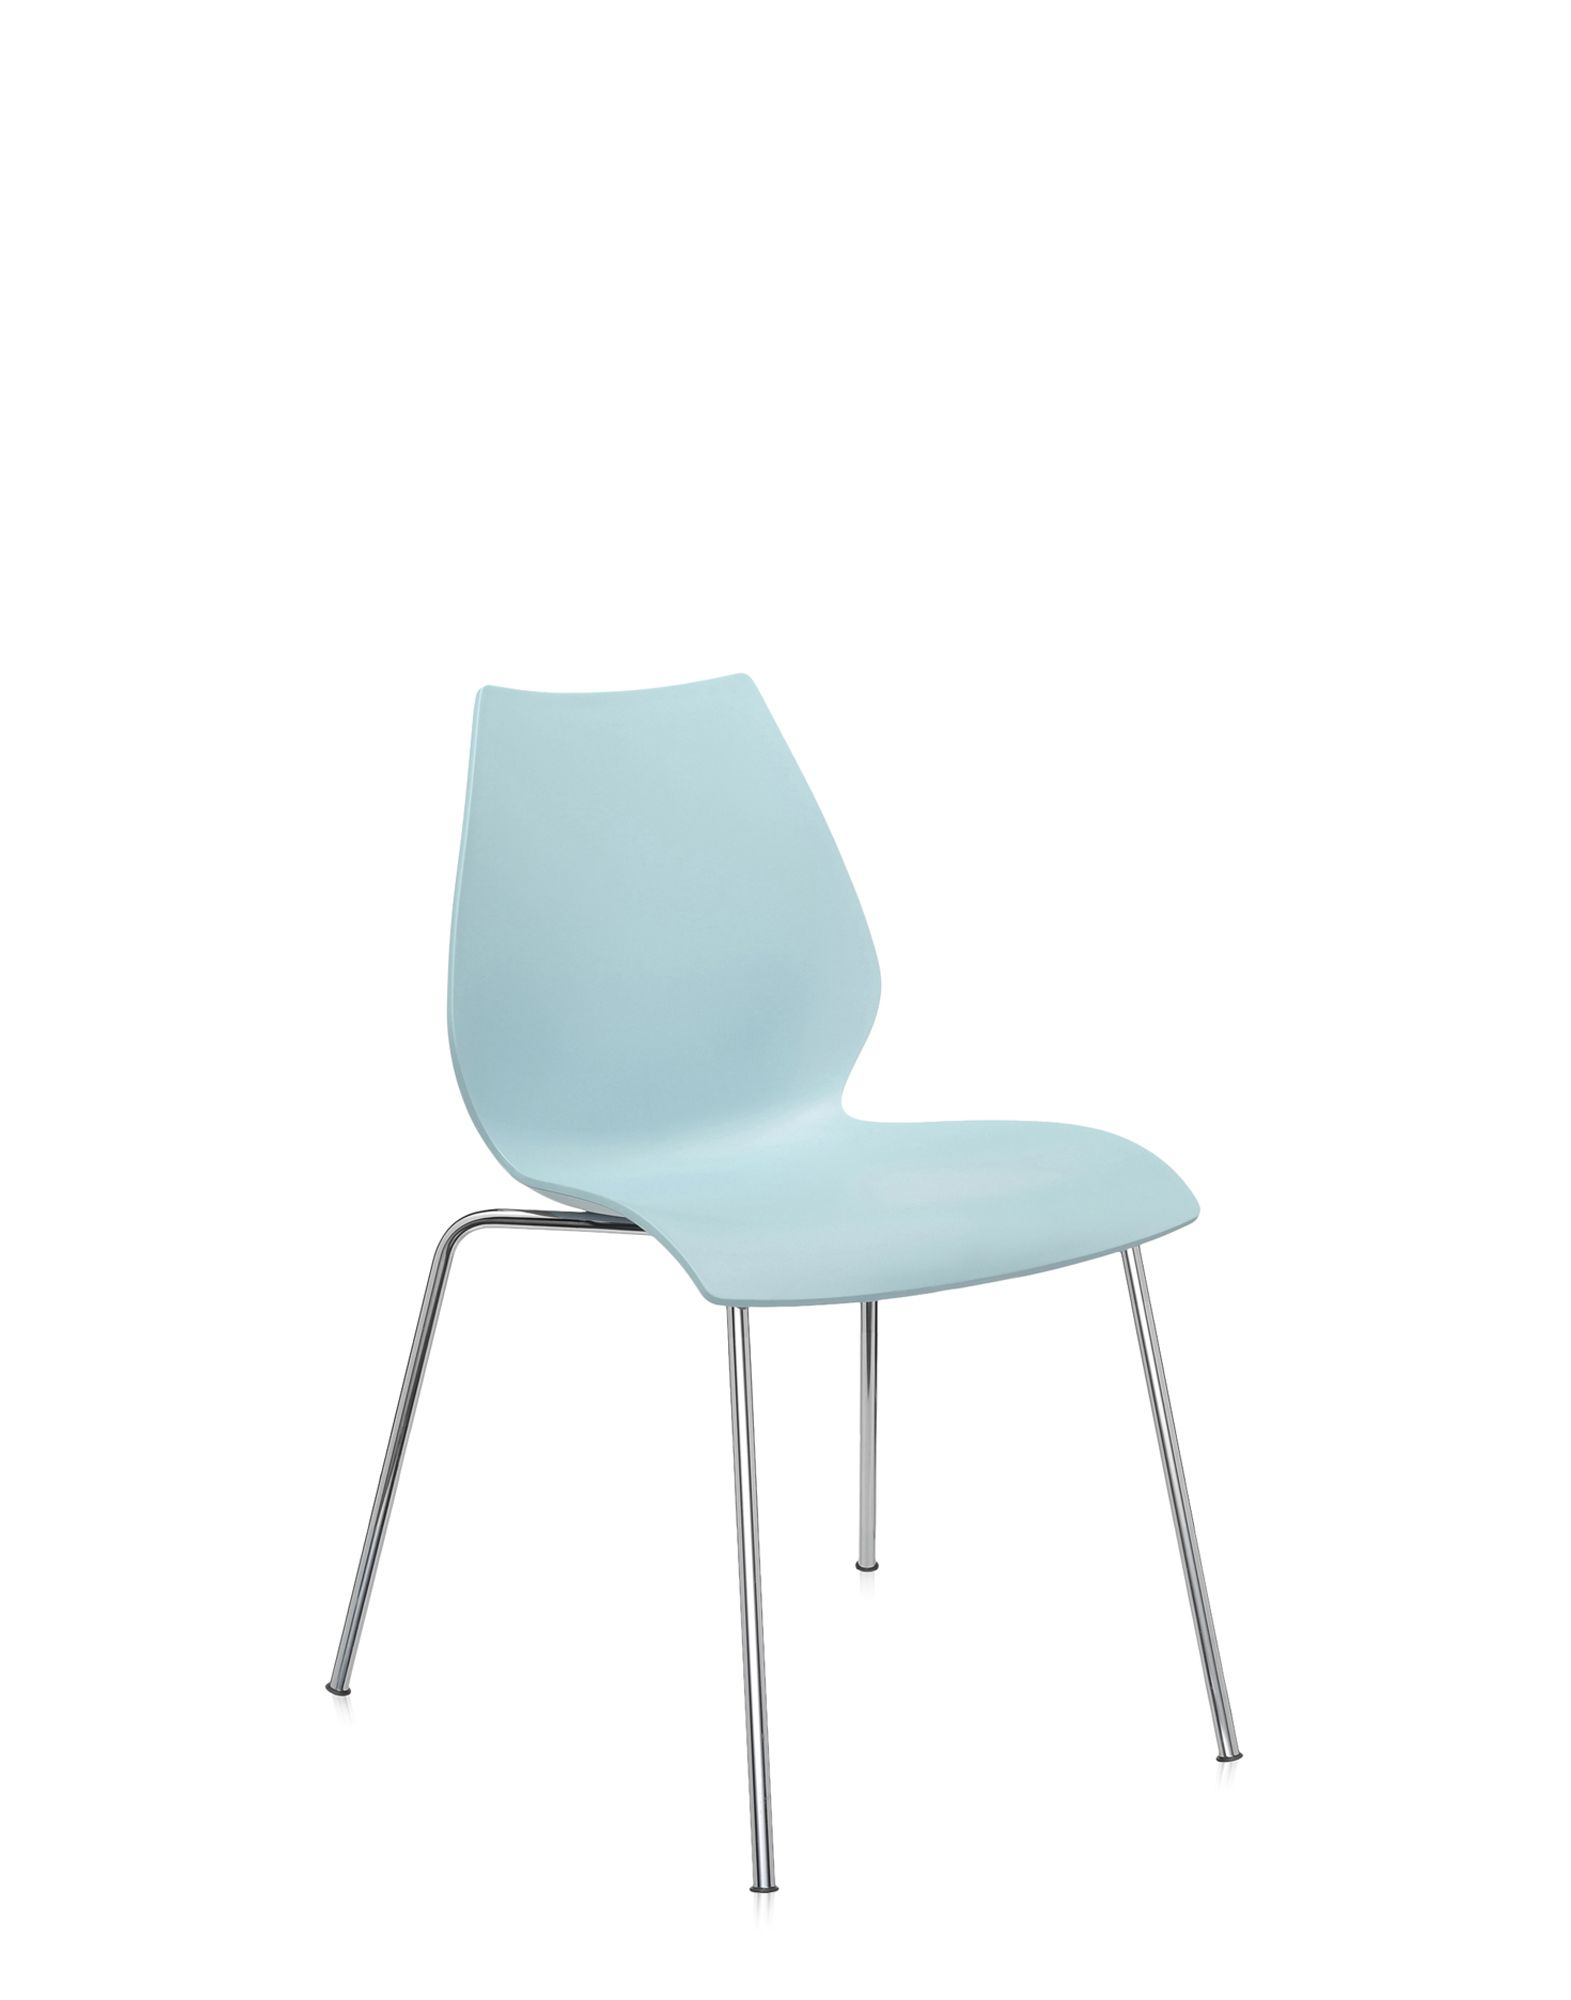 Kartell maui azzurro chiaro sedie design newformsdesign for Sedie design kartell